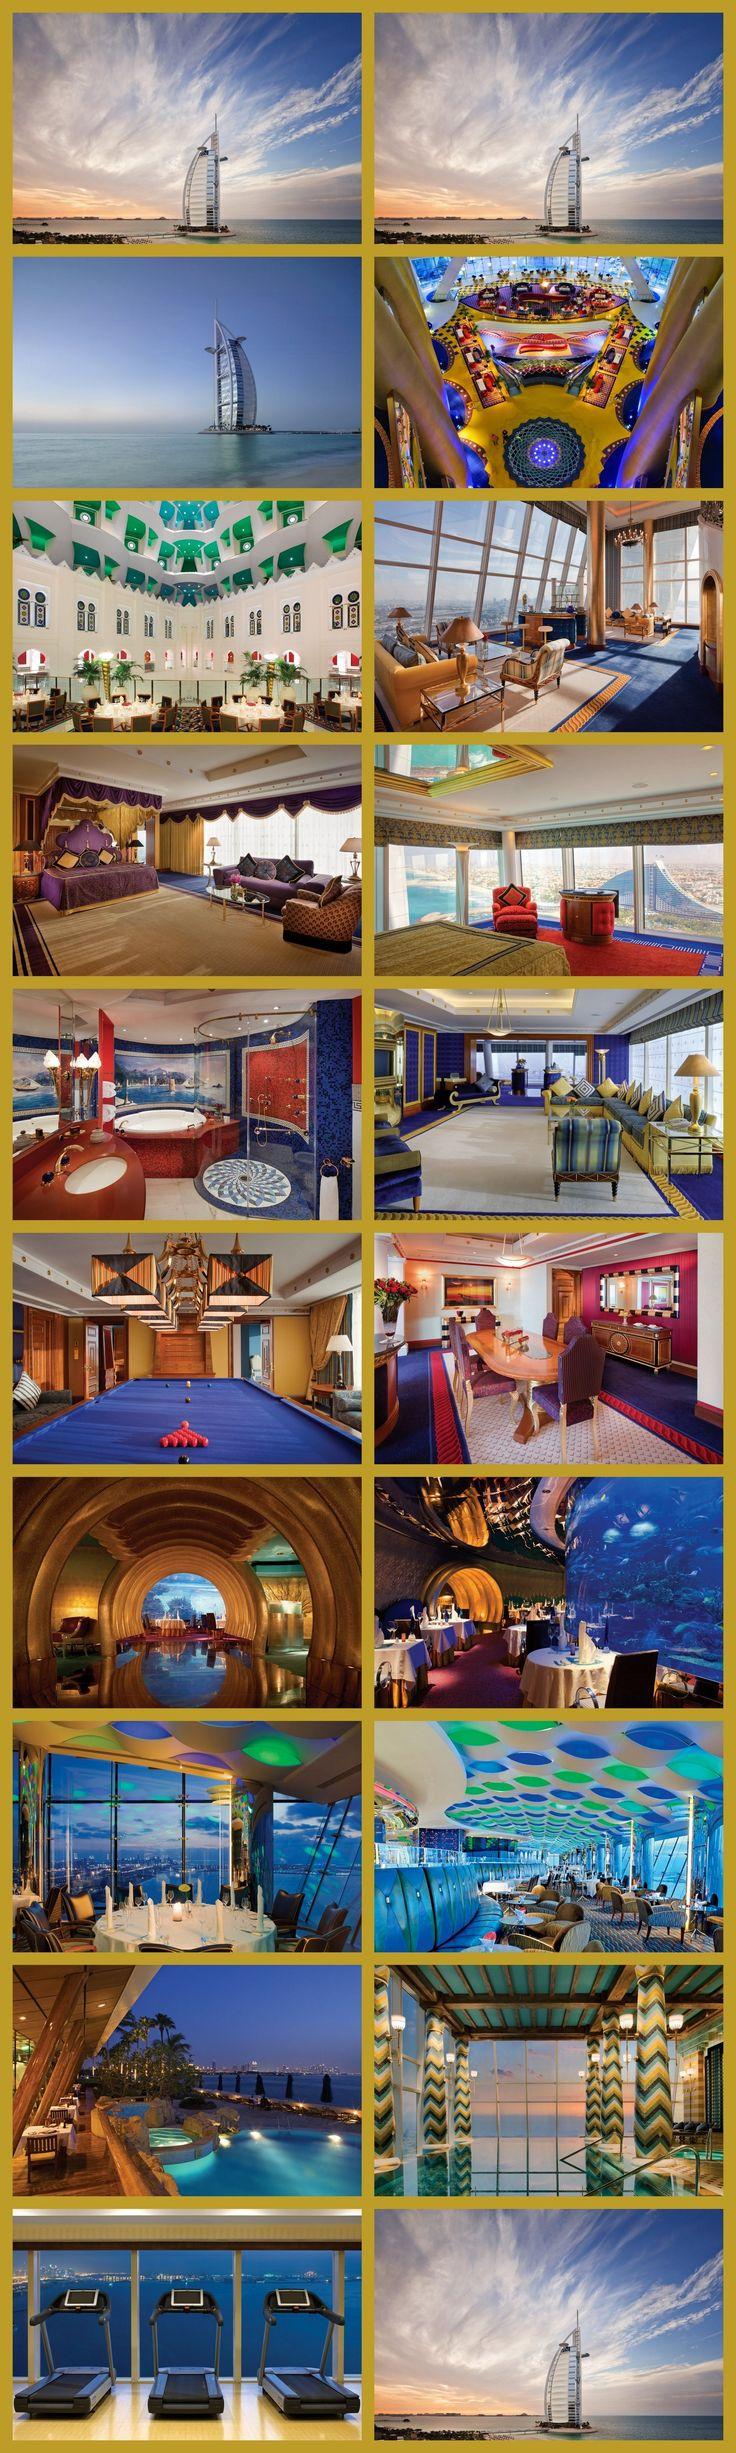 "Burj Al Arab ""World's Most Luxurious Hotel"" - Burj Al Arab ""Dünyanın En Lüks Oteli"""